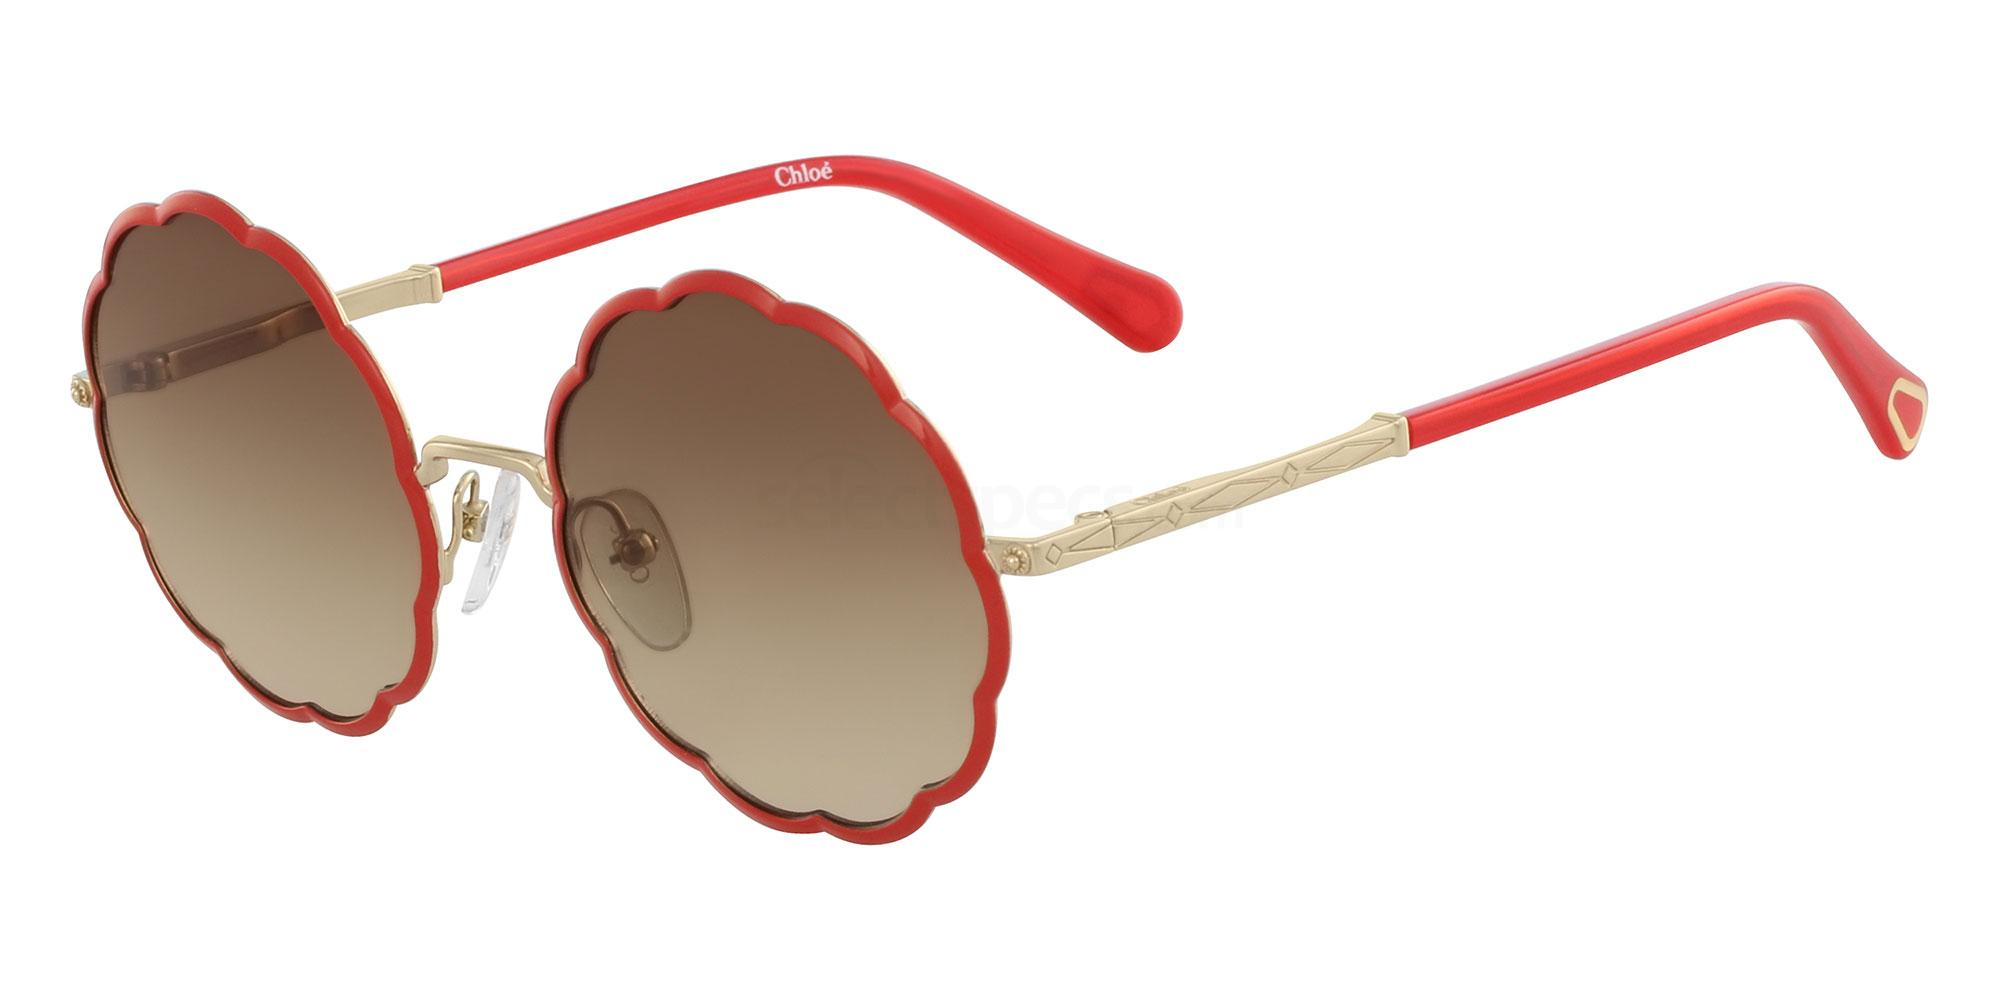 738 CE3103S Sunglasses, Chloe Kids